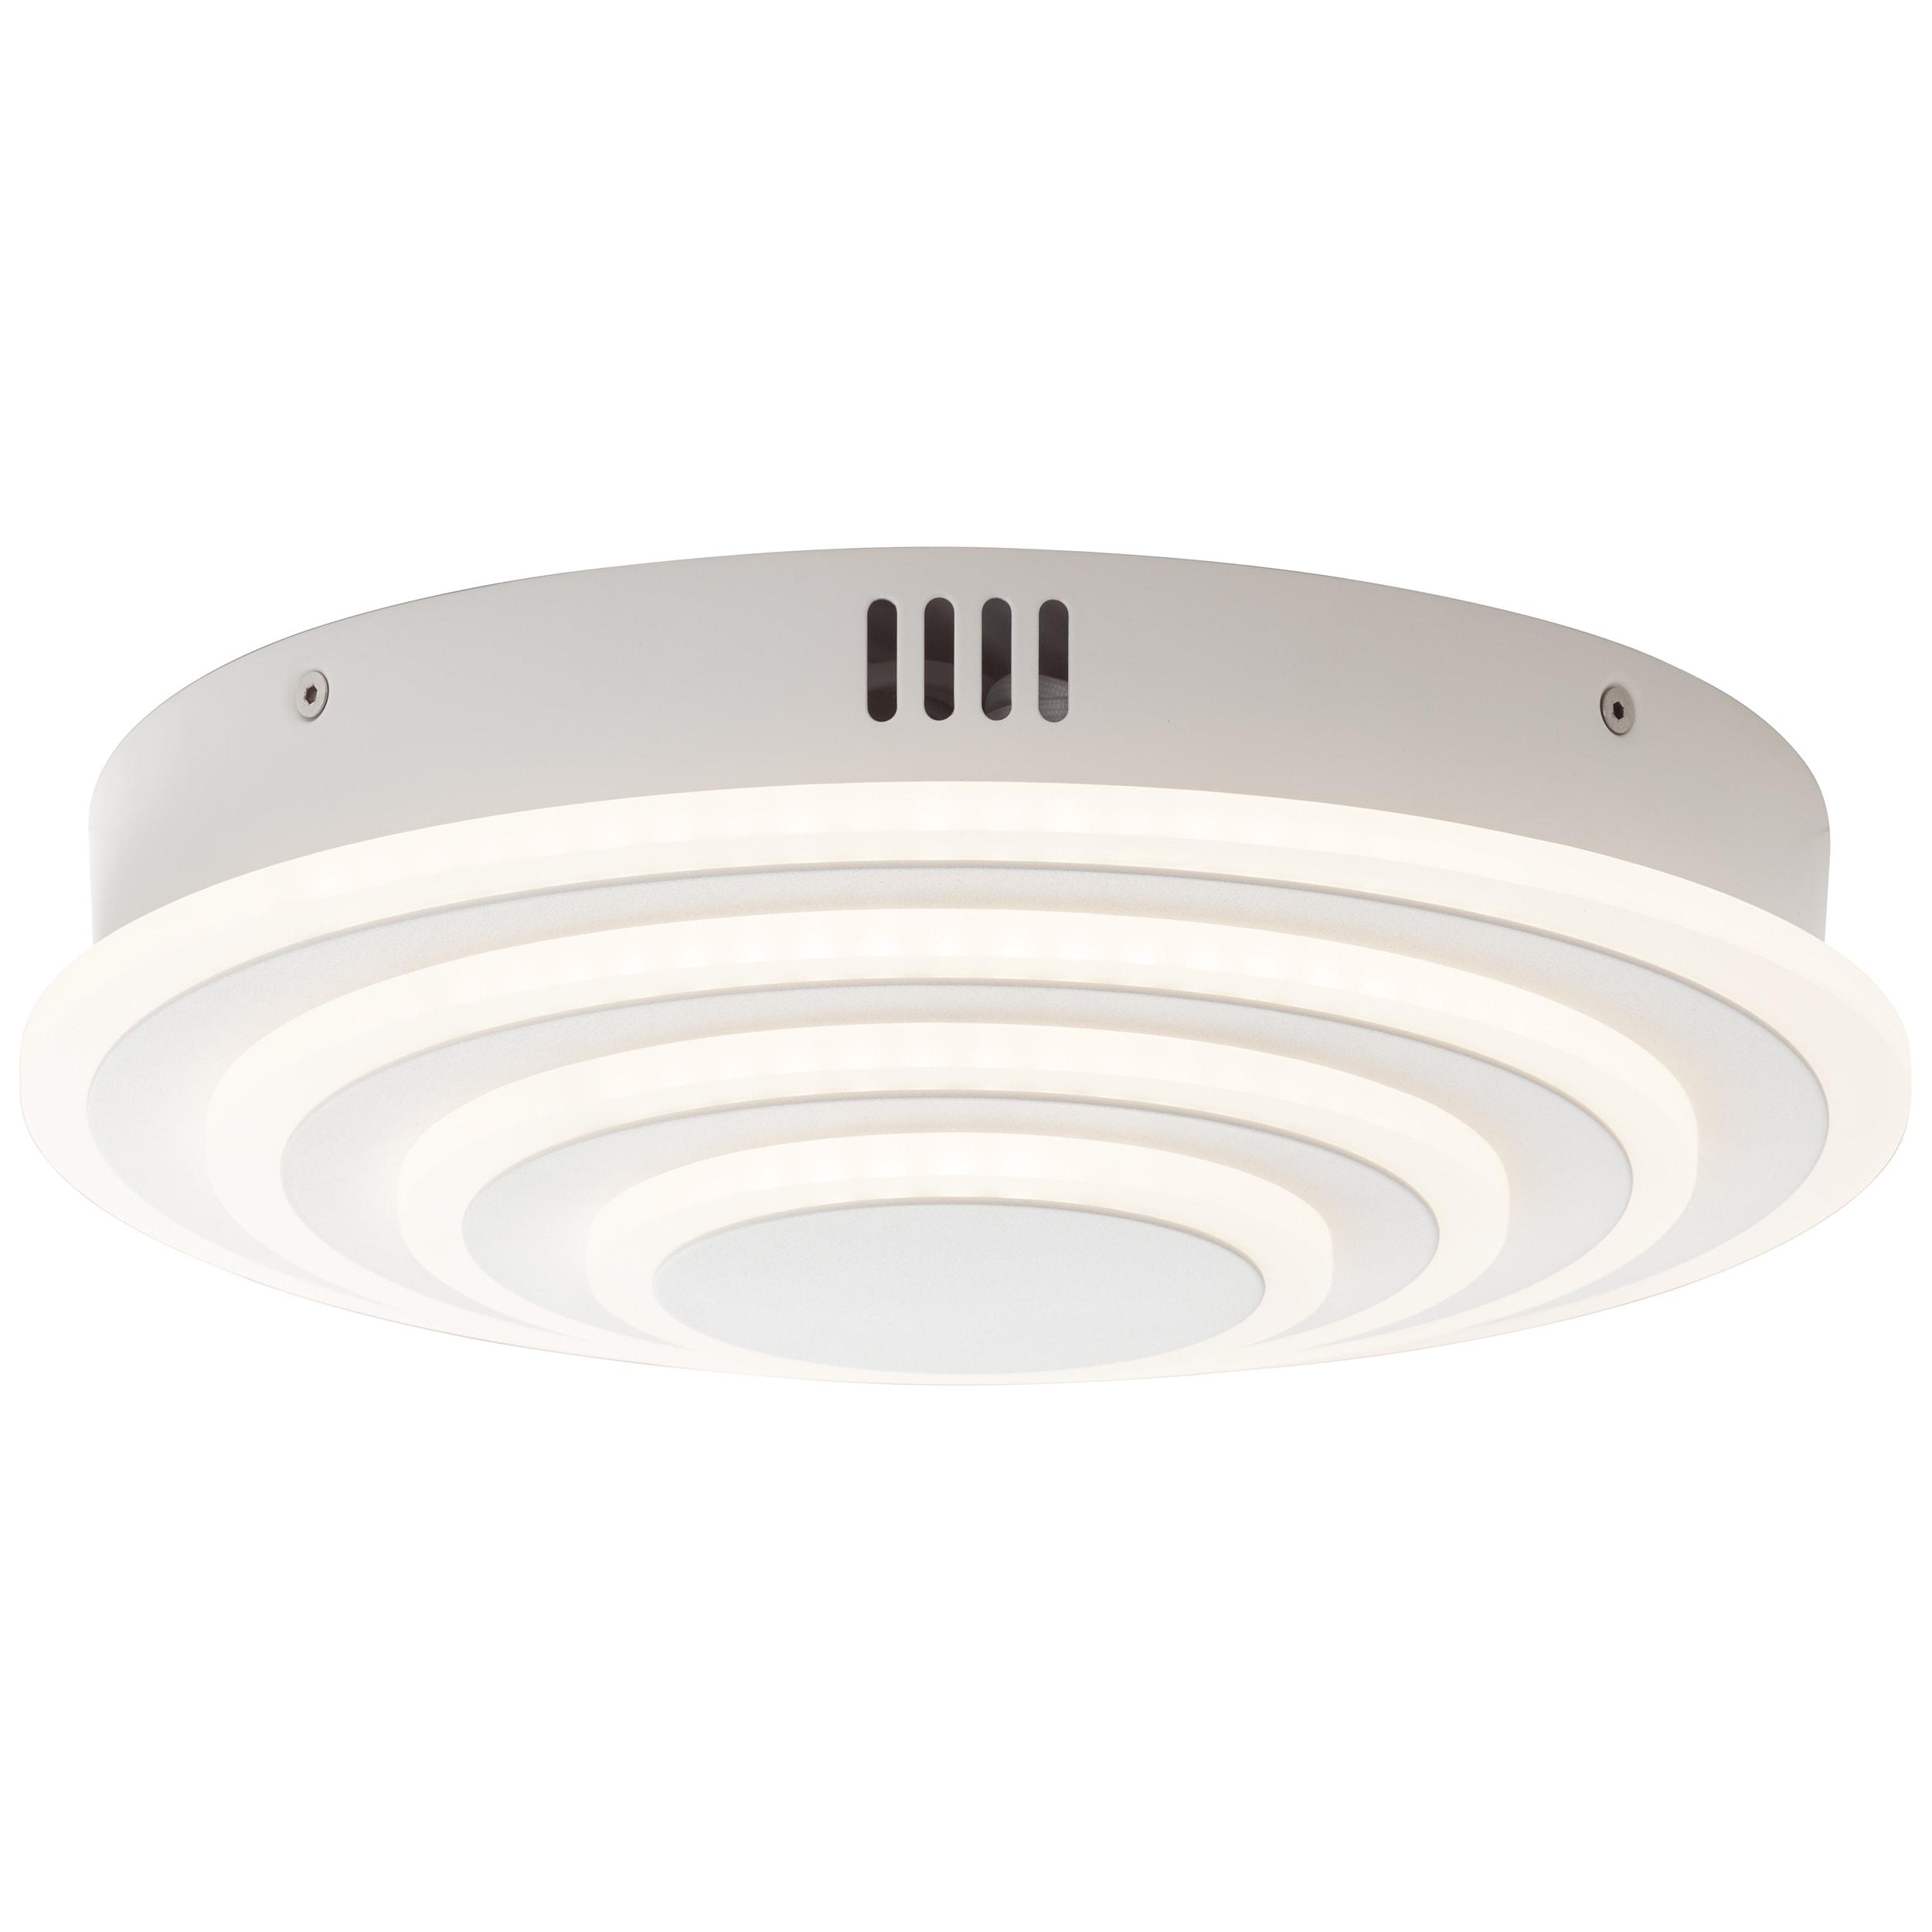 AEG Caresa LED Deckenleuchte 32cm sand/weiß